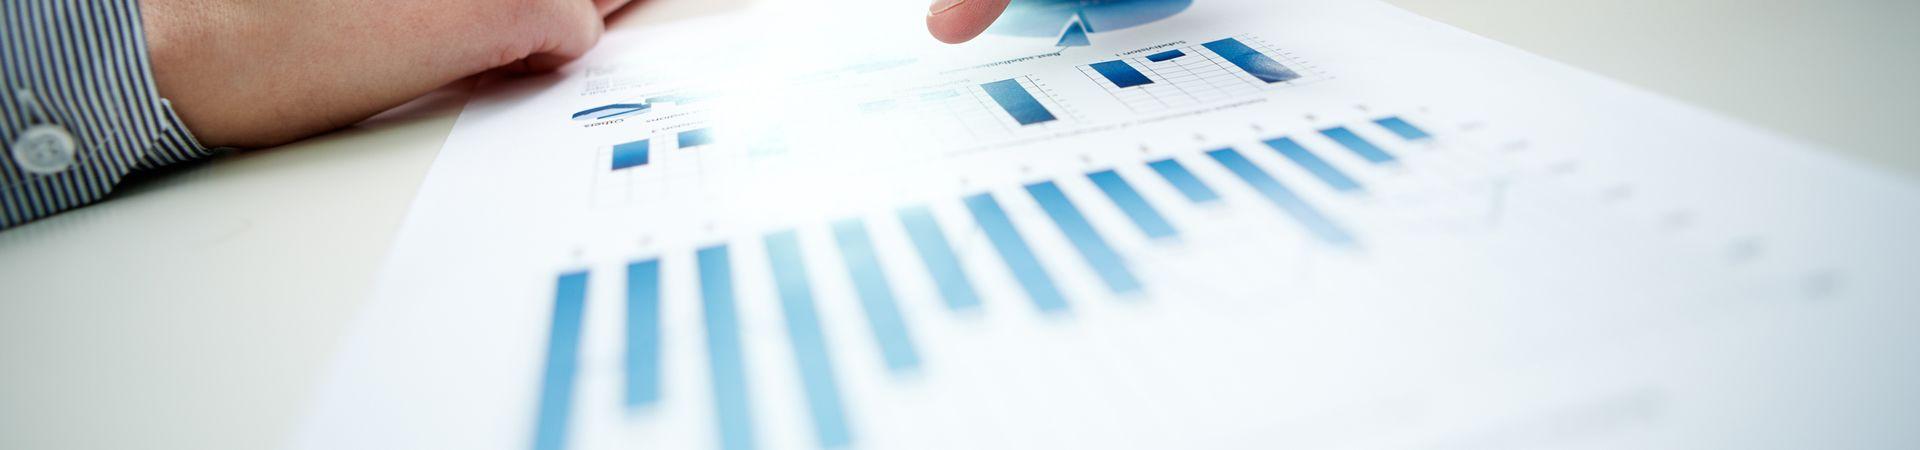 Estudos de Viabilidade Económica